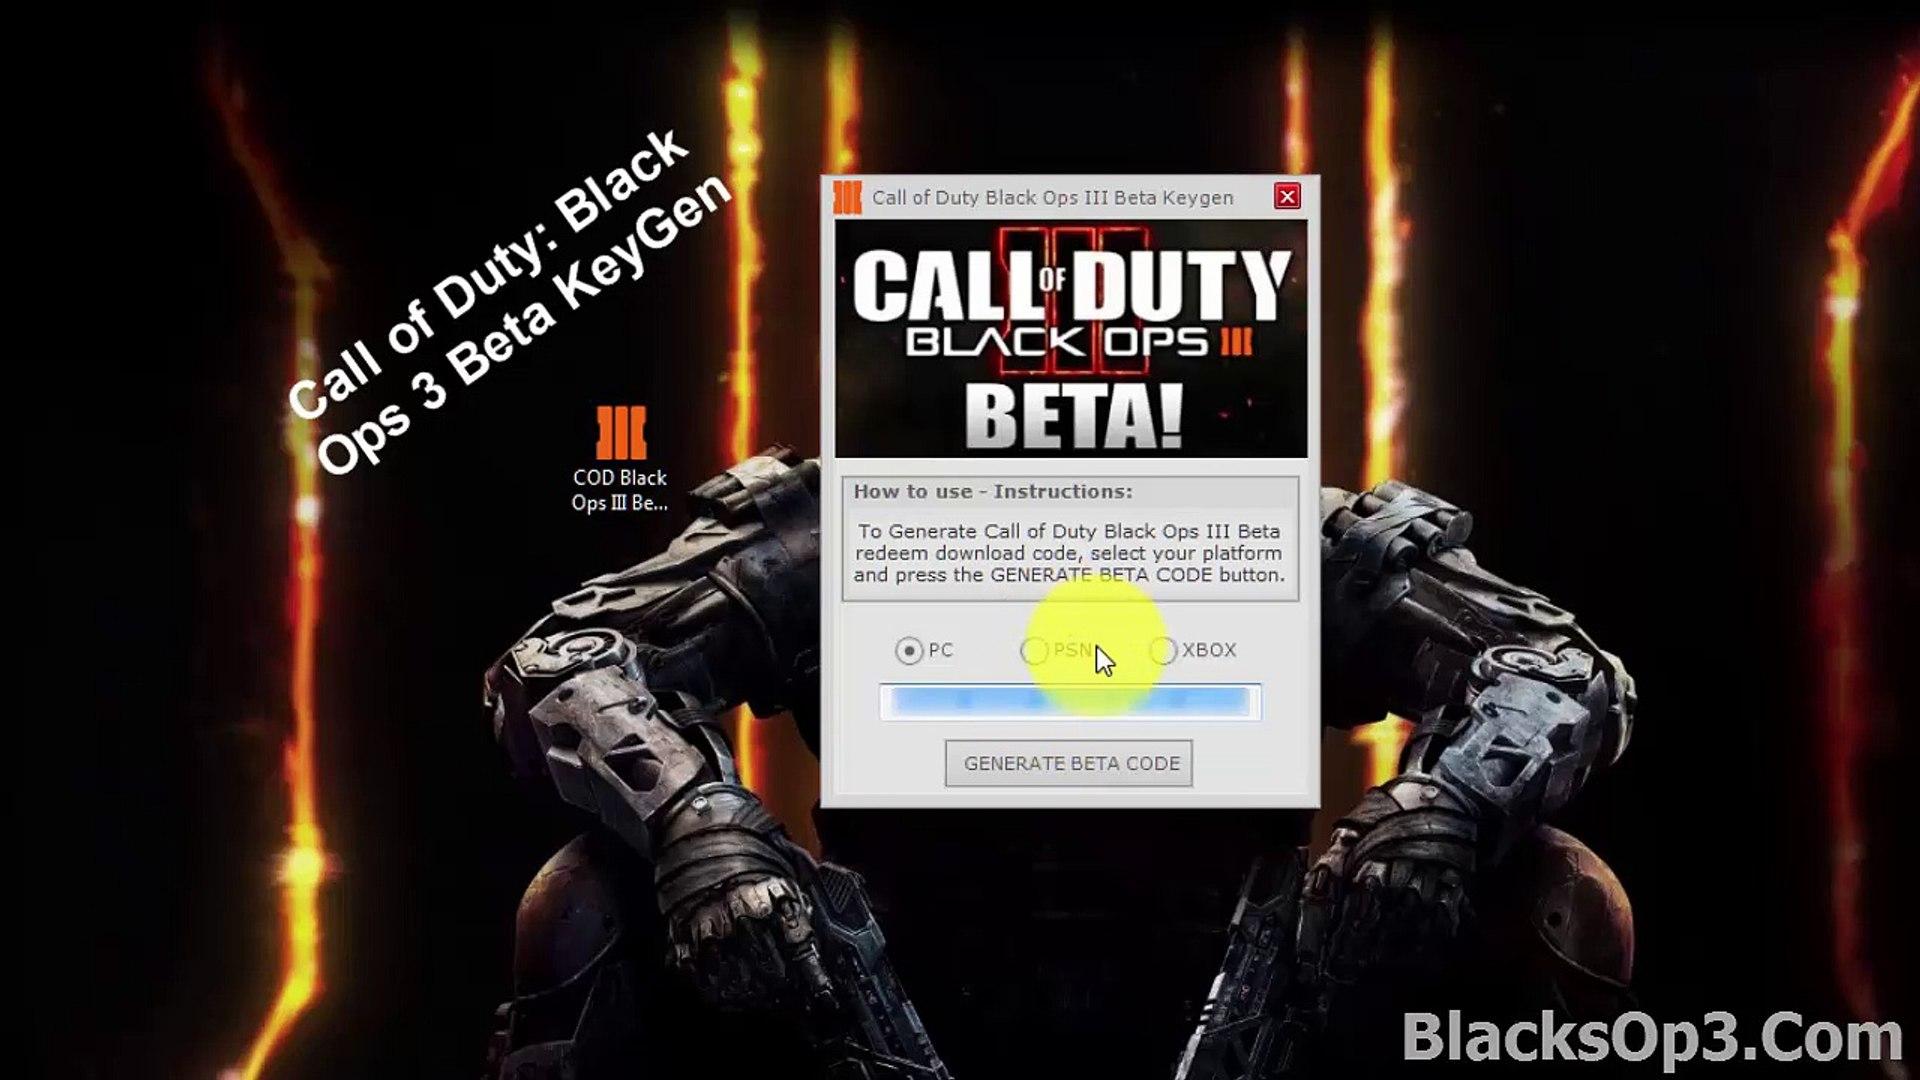 Call of Duty Black Ops III Beta Code Generator FrEe Download